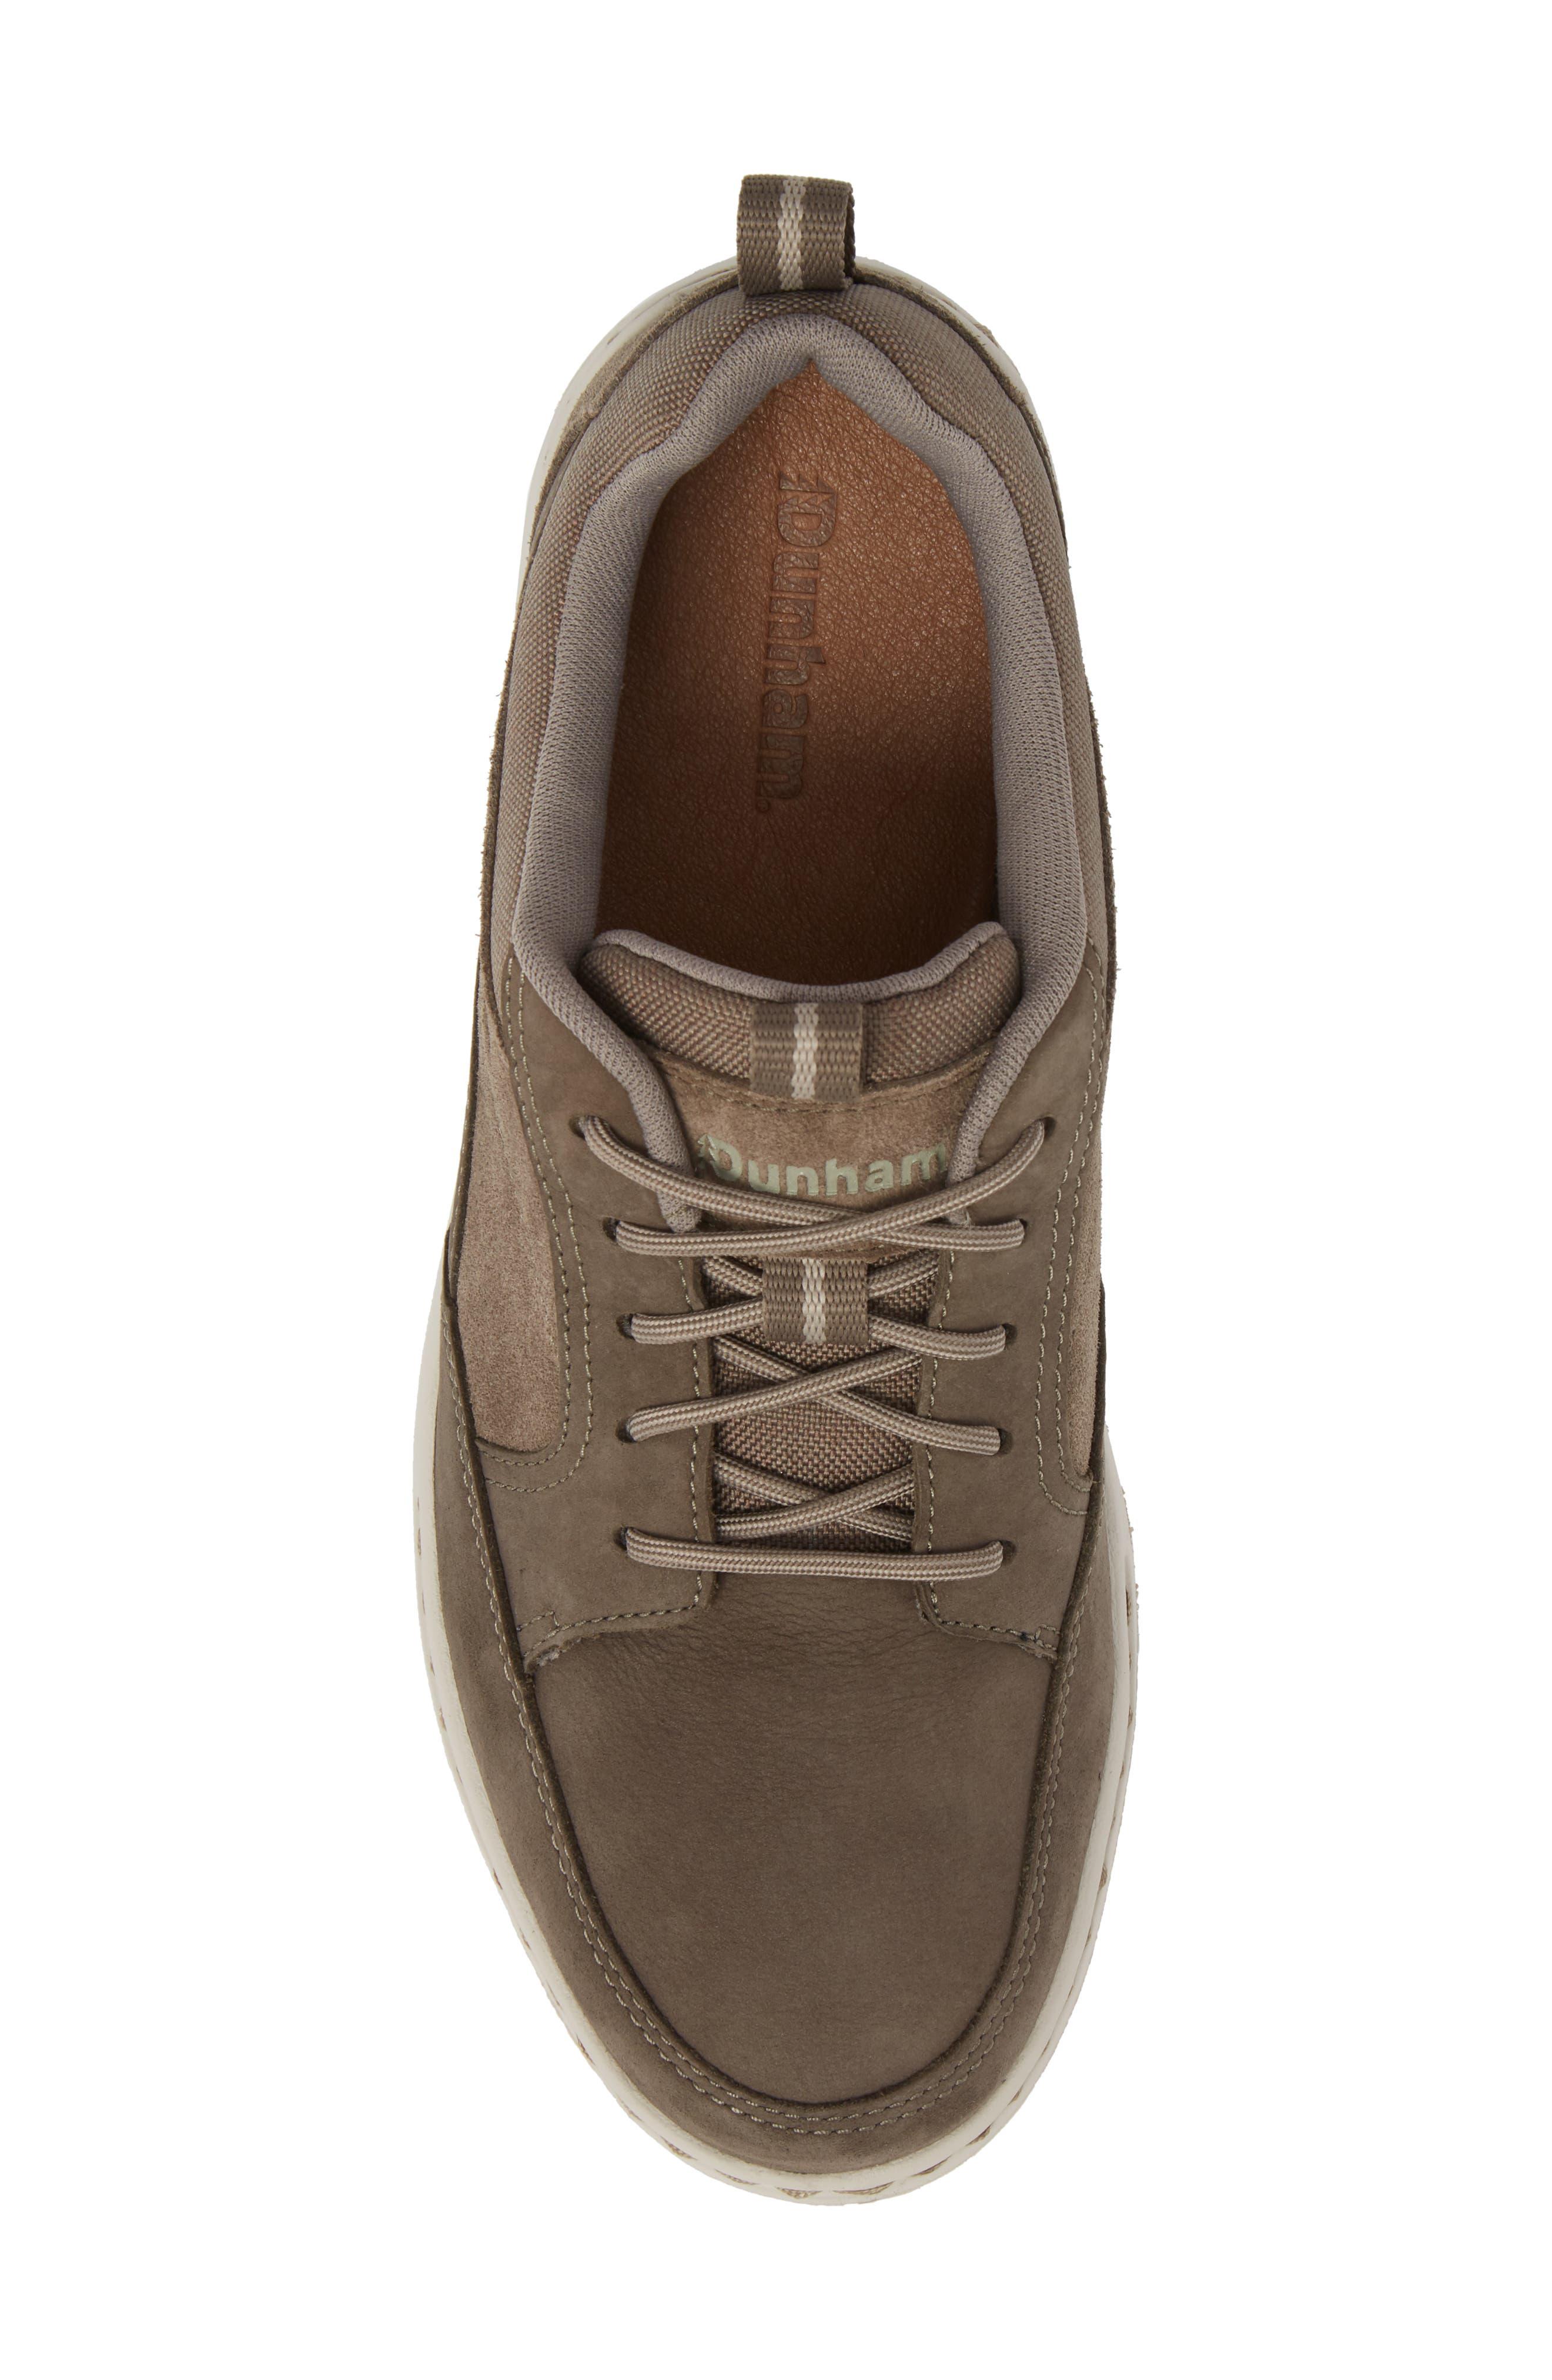 DUNHAM, D Fit Smart Sneaker, Alternate thumbnail 5, color, BROWN